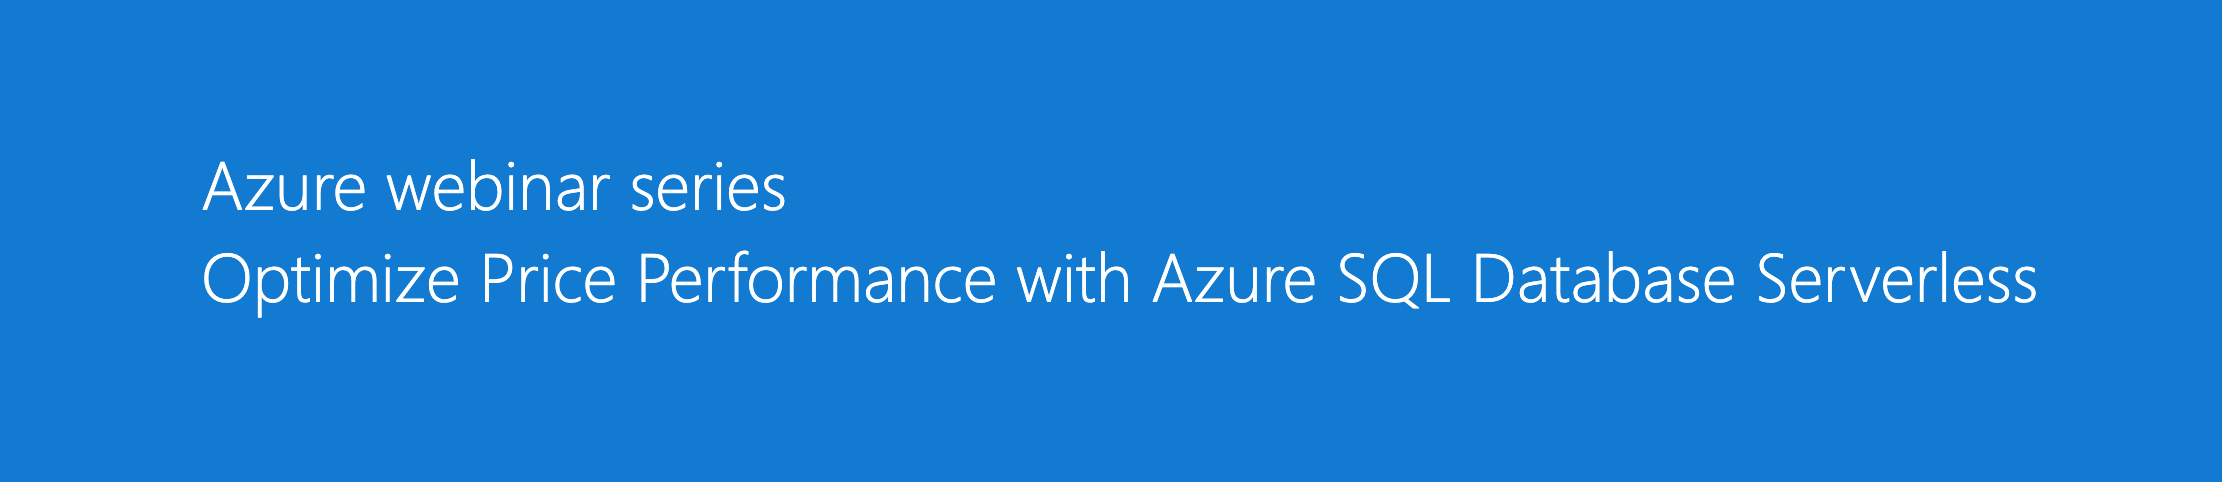 Microsoft Azure Webinar: Optimize Price Performance with Azure SQL Database Serverless